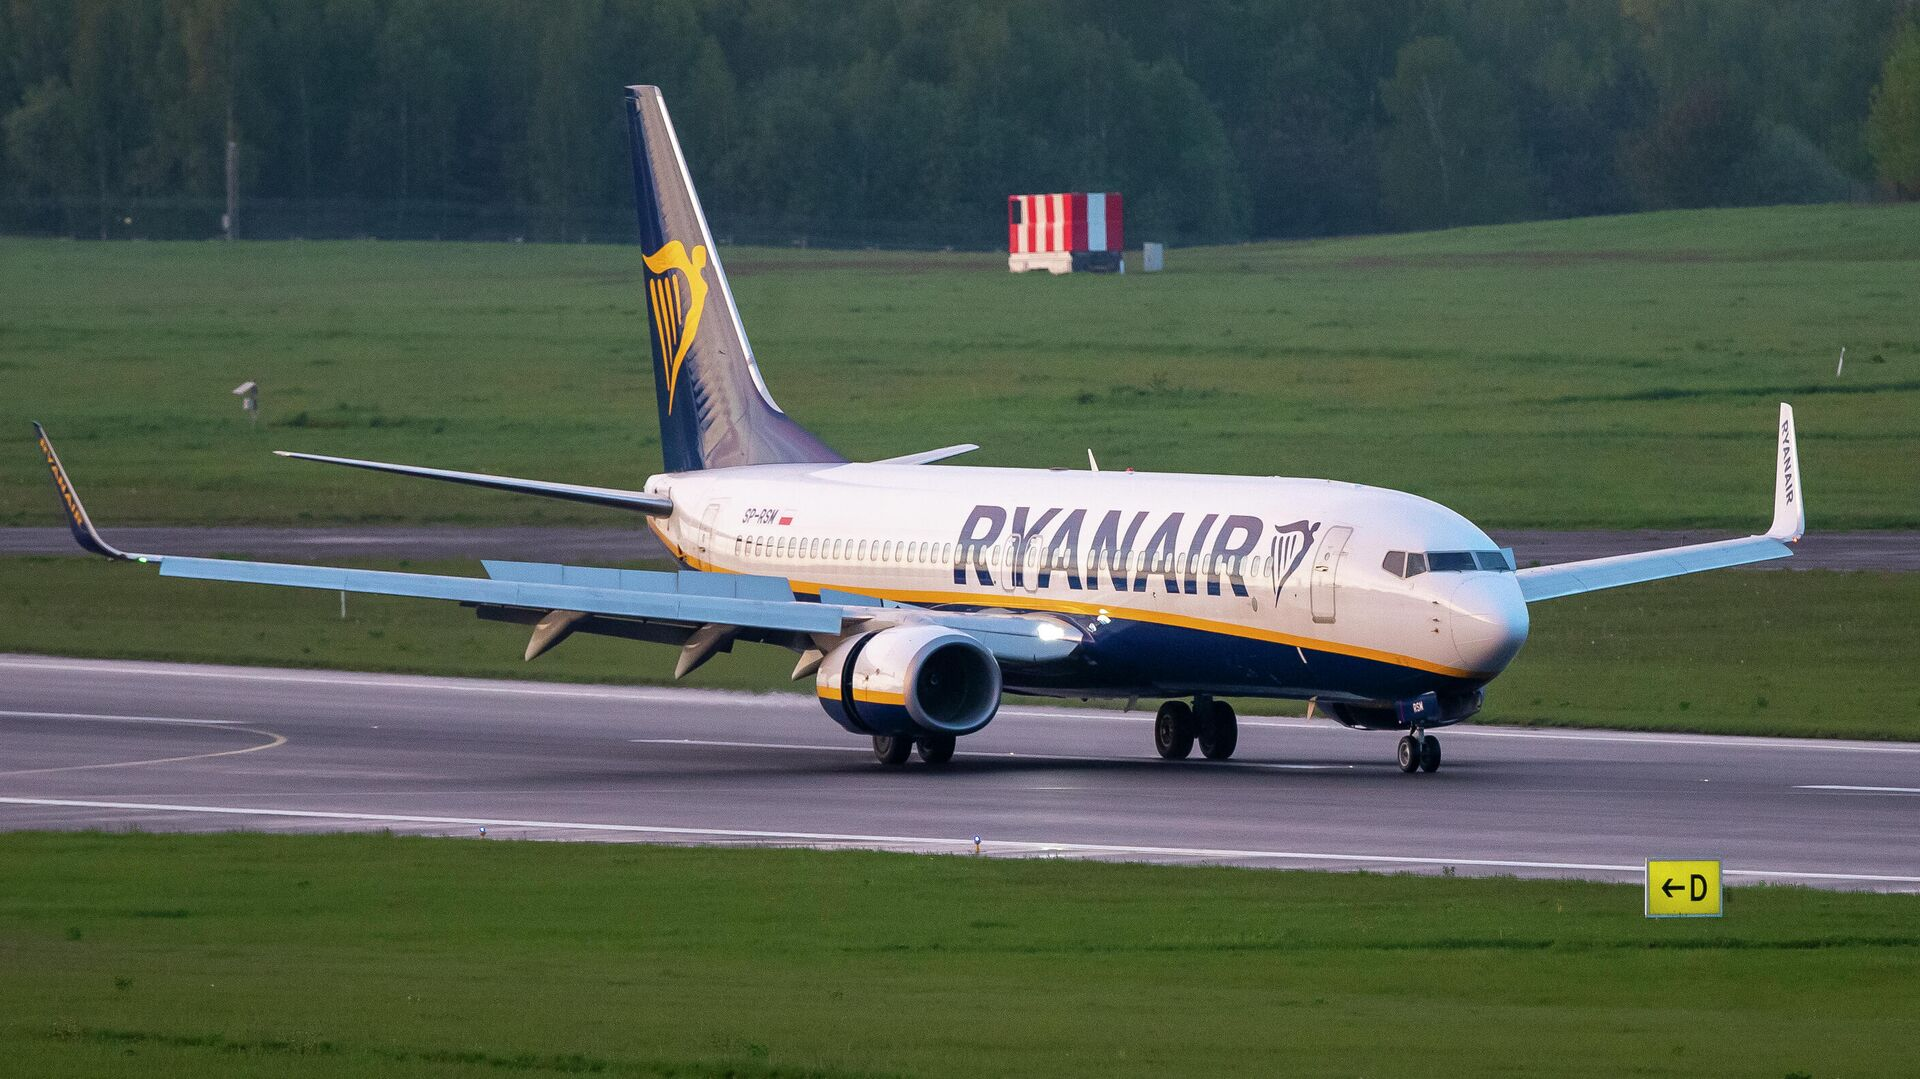 Самолет авиакомпании Ryanair, на котором находился Роман Протасевич, в аэропорту Вильнюса - РИА Новости, 1920, 25.05.2021